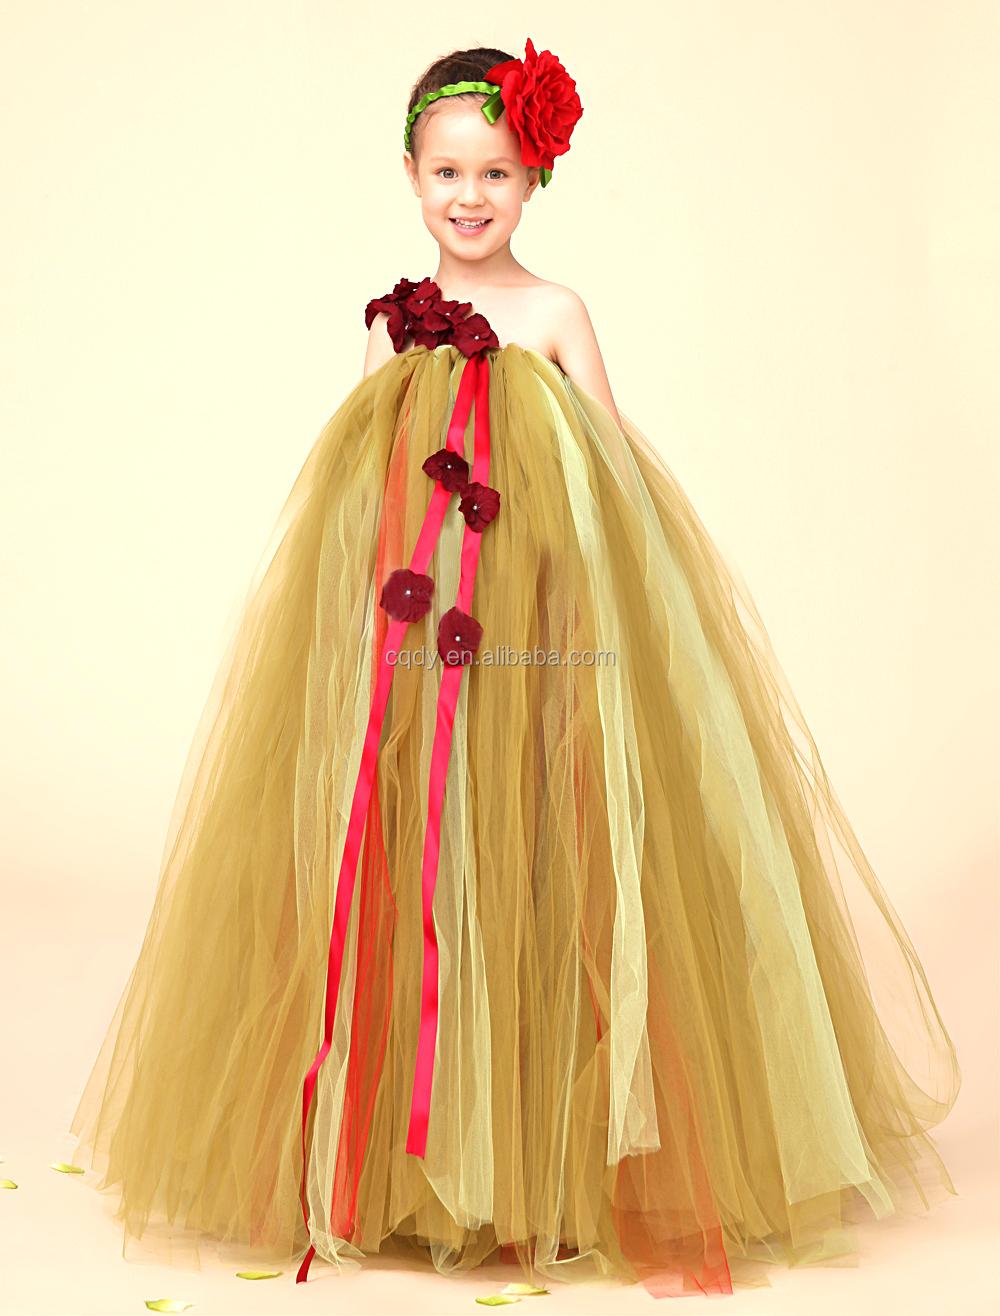 70da2ee919b9b 2016 new Korean model girl dress kids wedding dress /Baby girl birthday clothing  baby frock